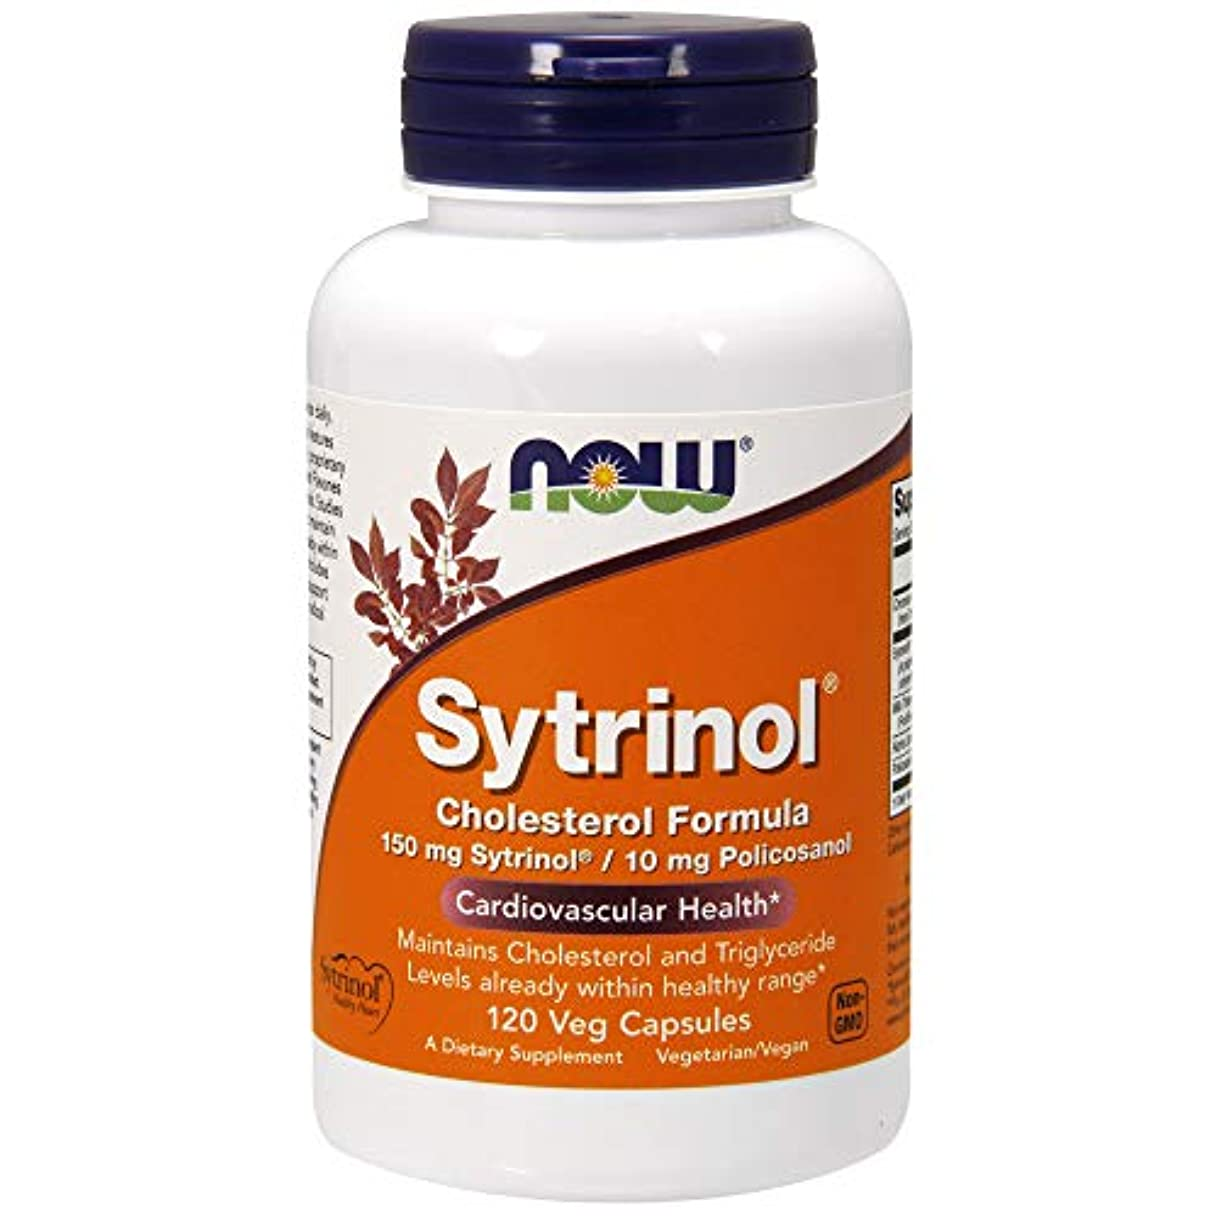 司書落ちた独裁海外直送品 Now Foods Sytrinol, 120 Vcaps 150 mg